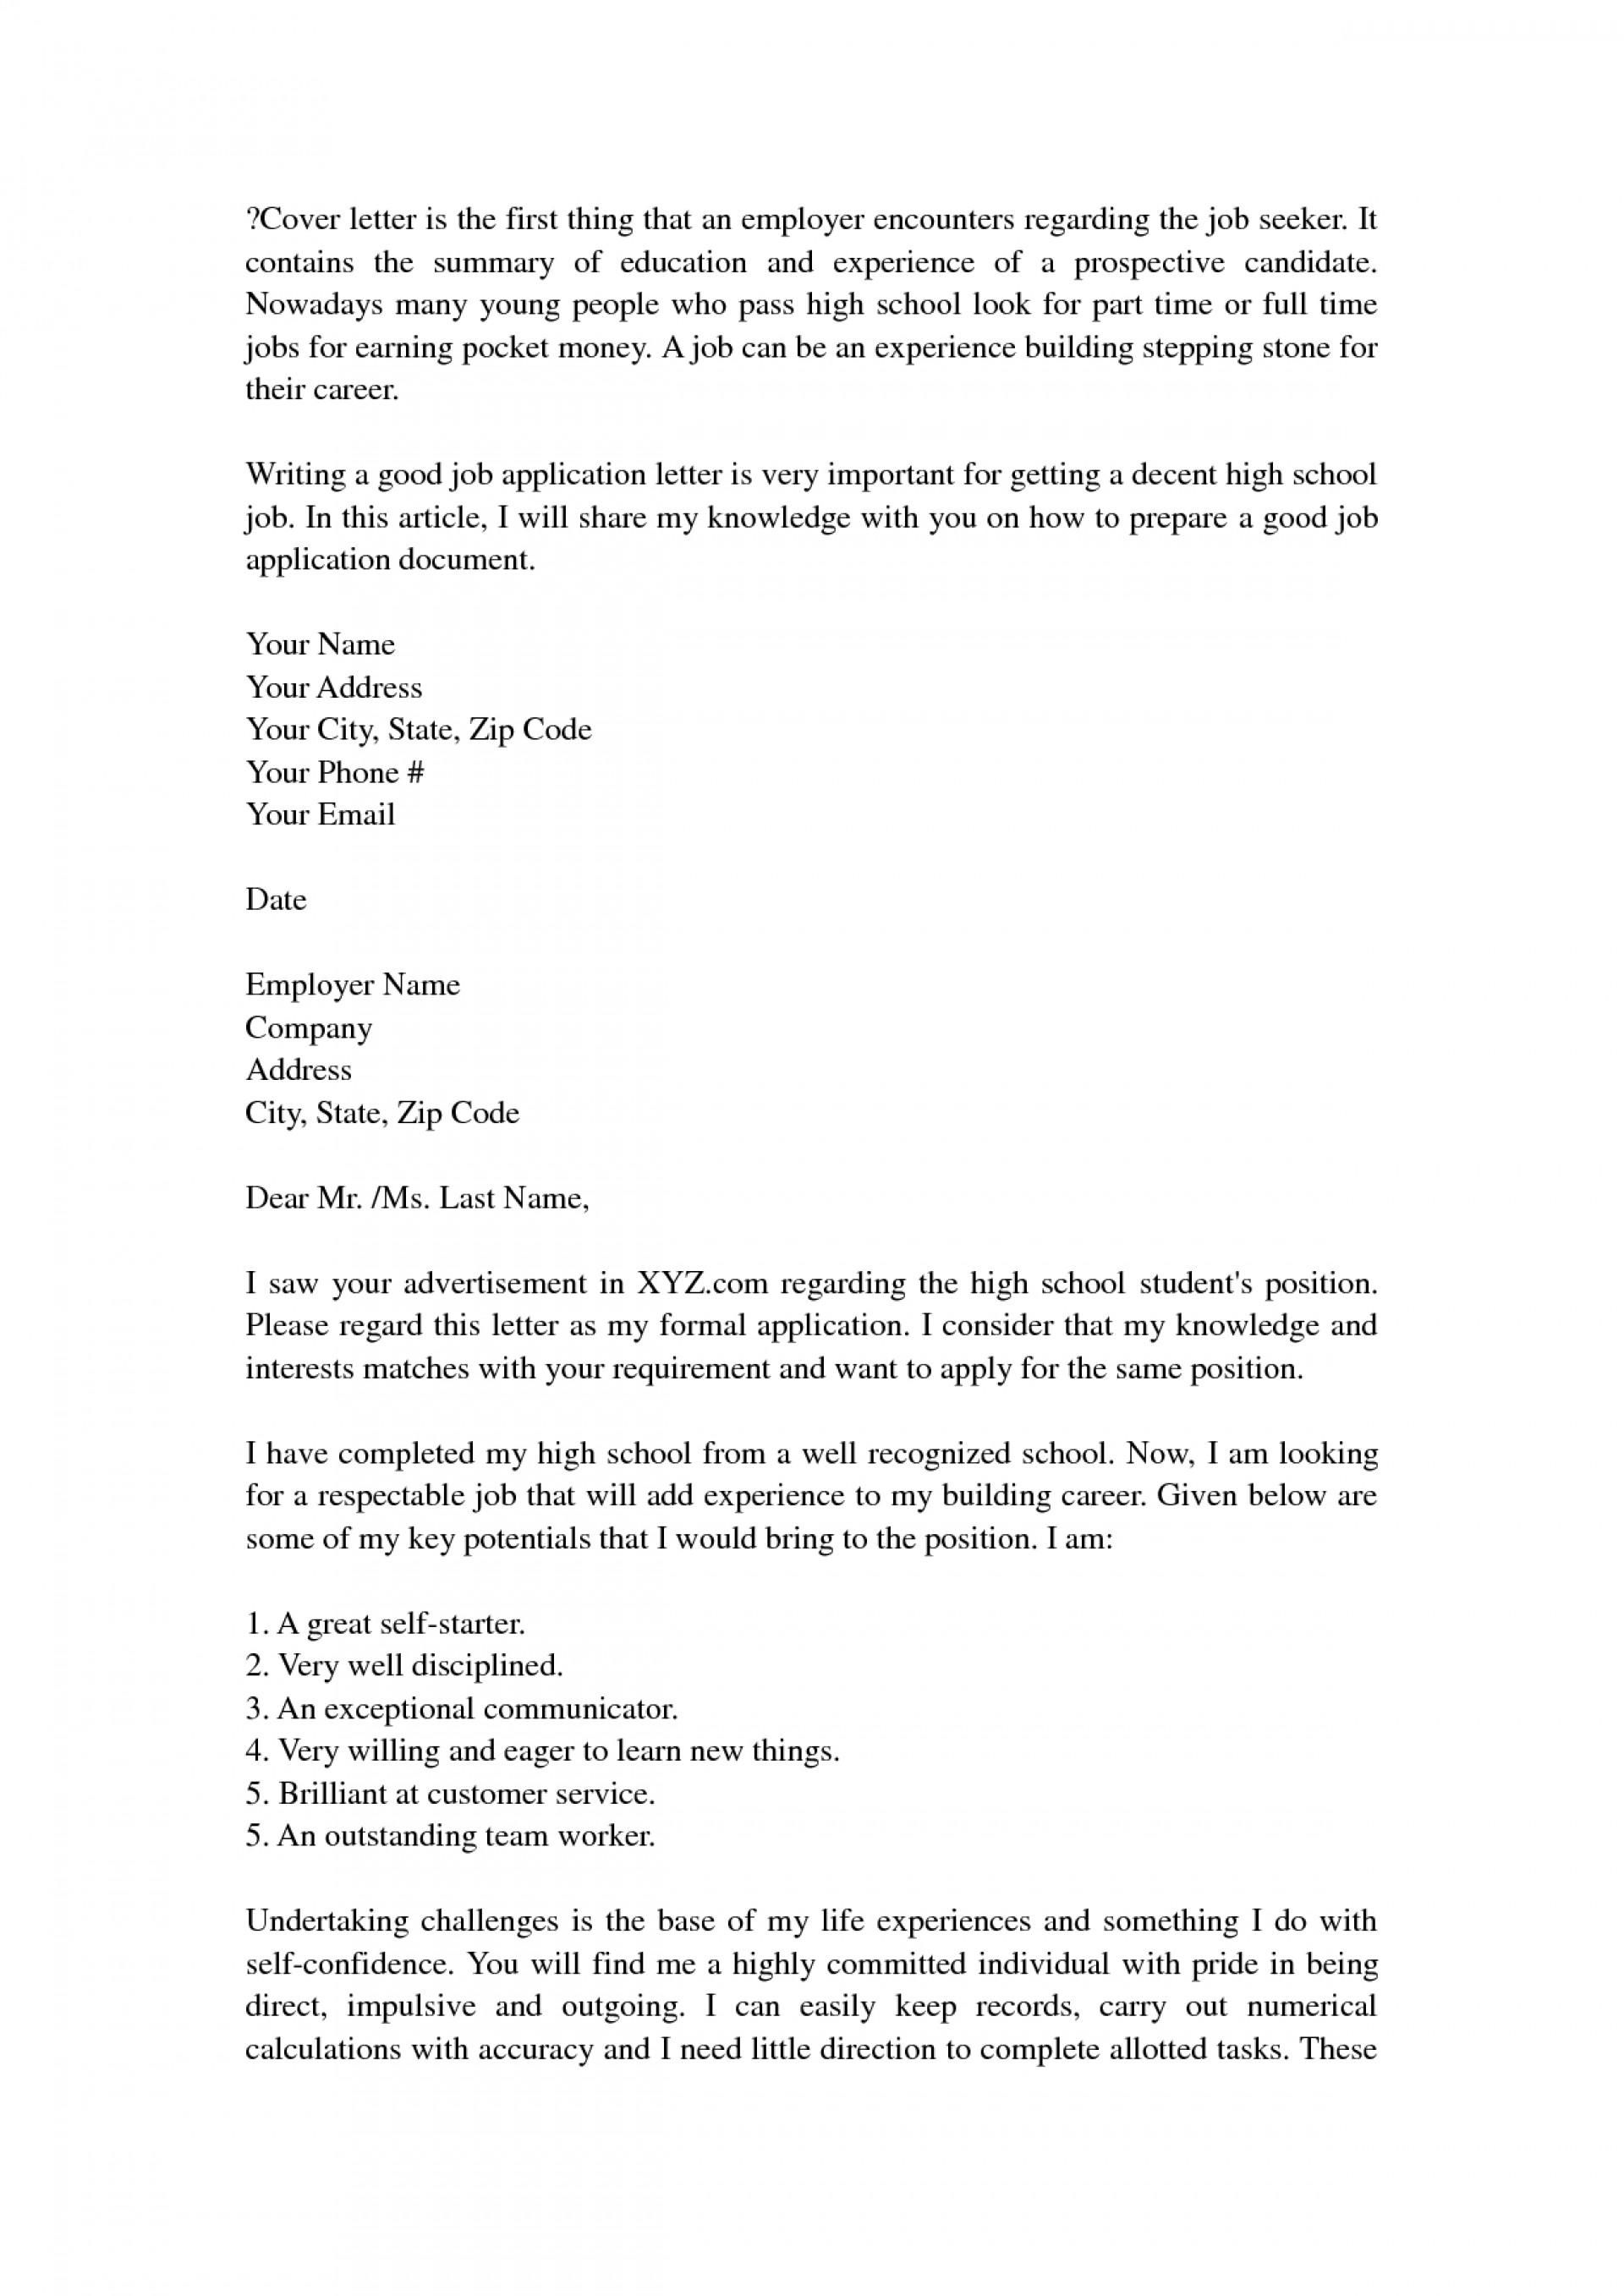 003 High School Essay Writing Scholarships For Students How Catholic Sample Essays Professionalism Sensational Pdf Conclusion Teacher 1920